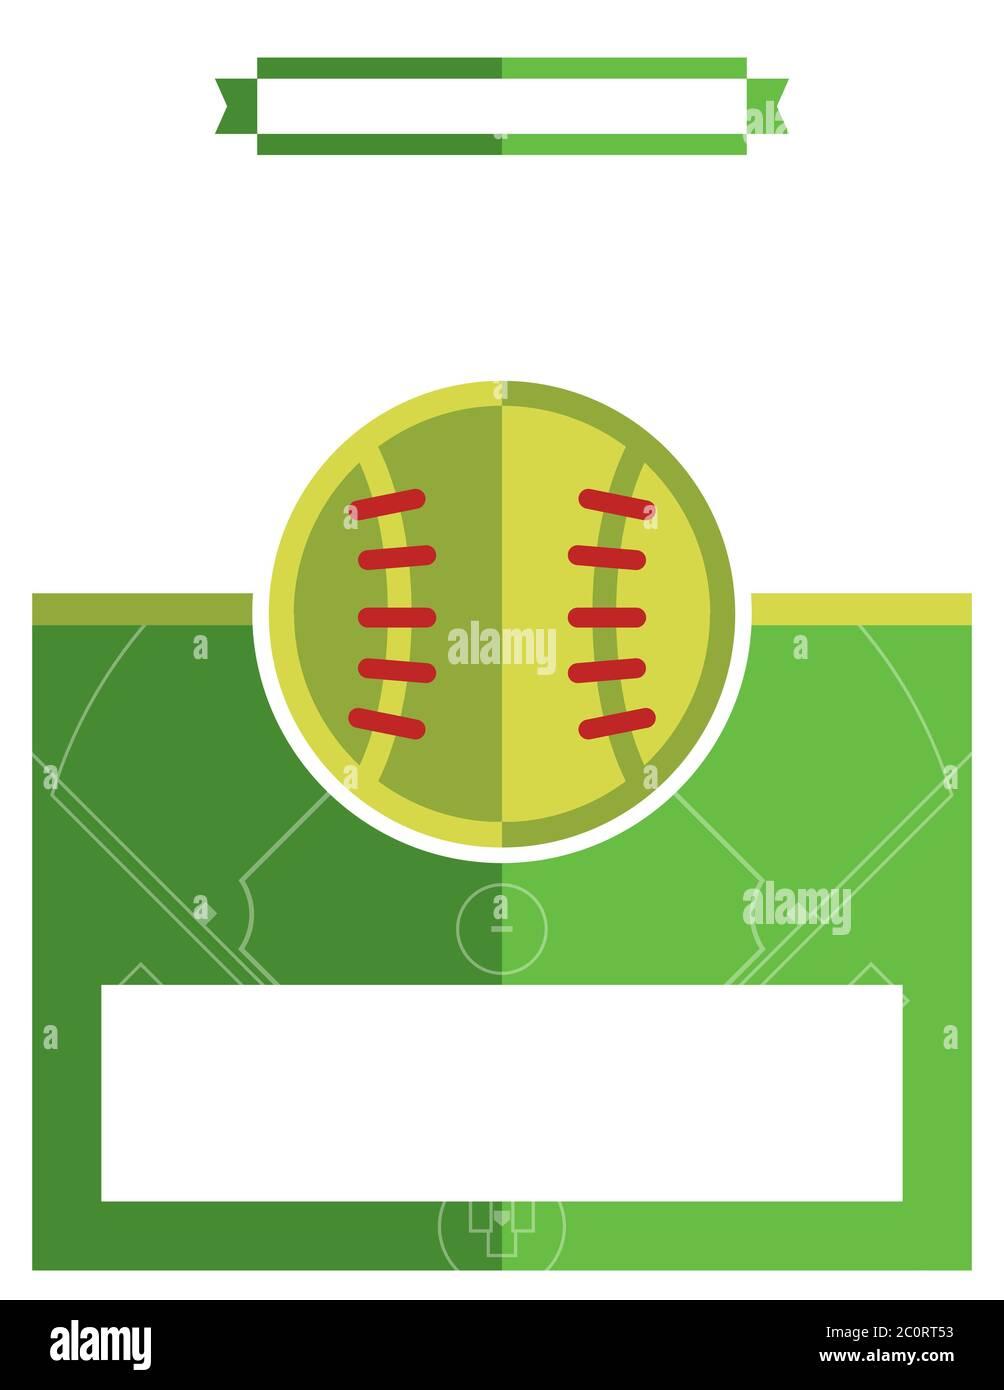 Softball Game Flyer Illustration Stock Photo